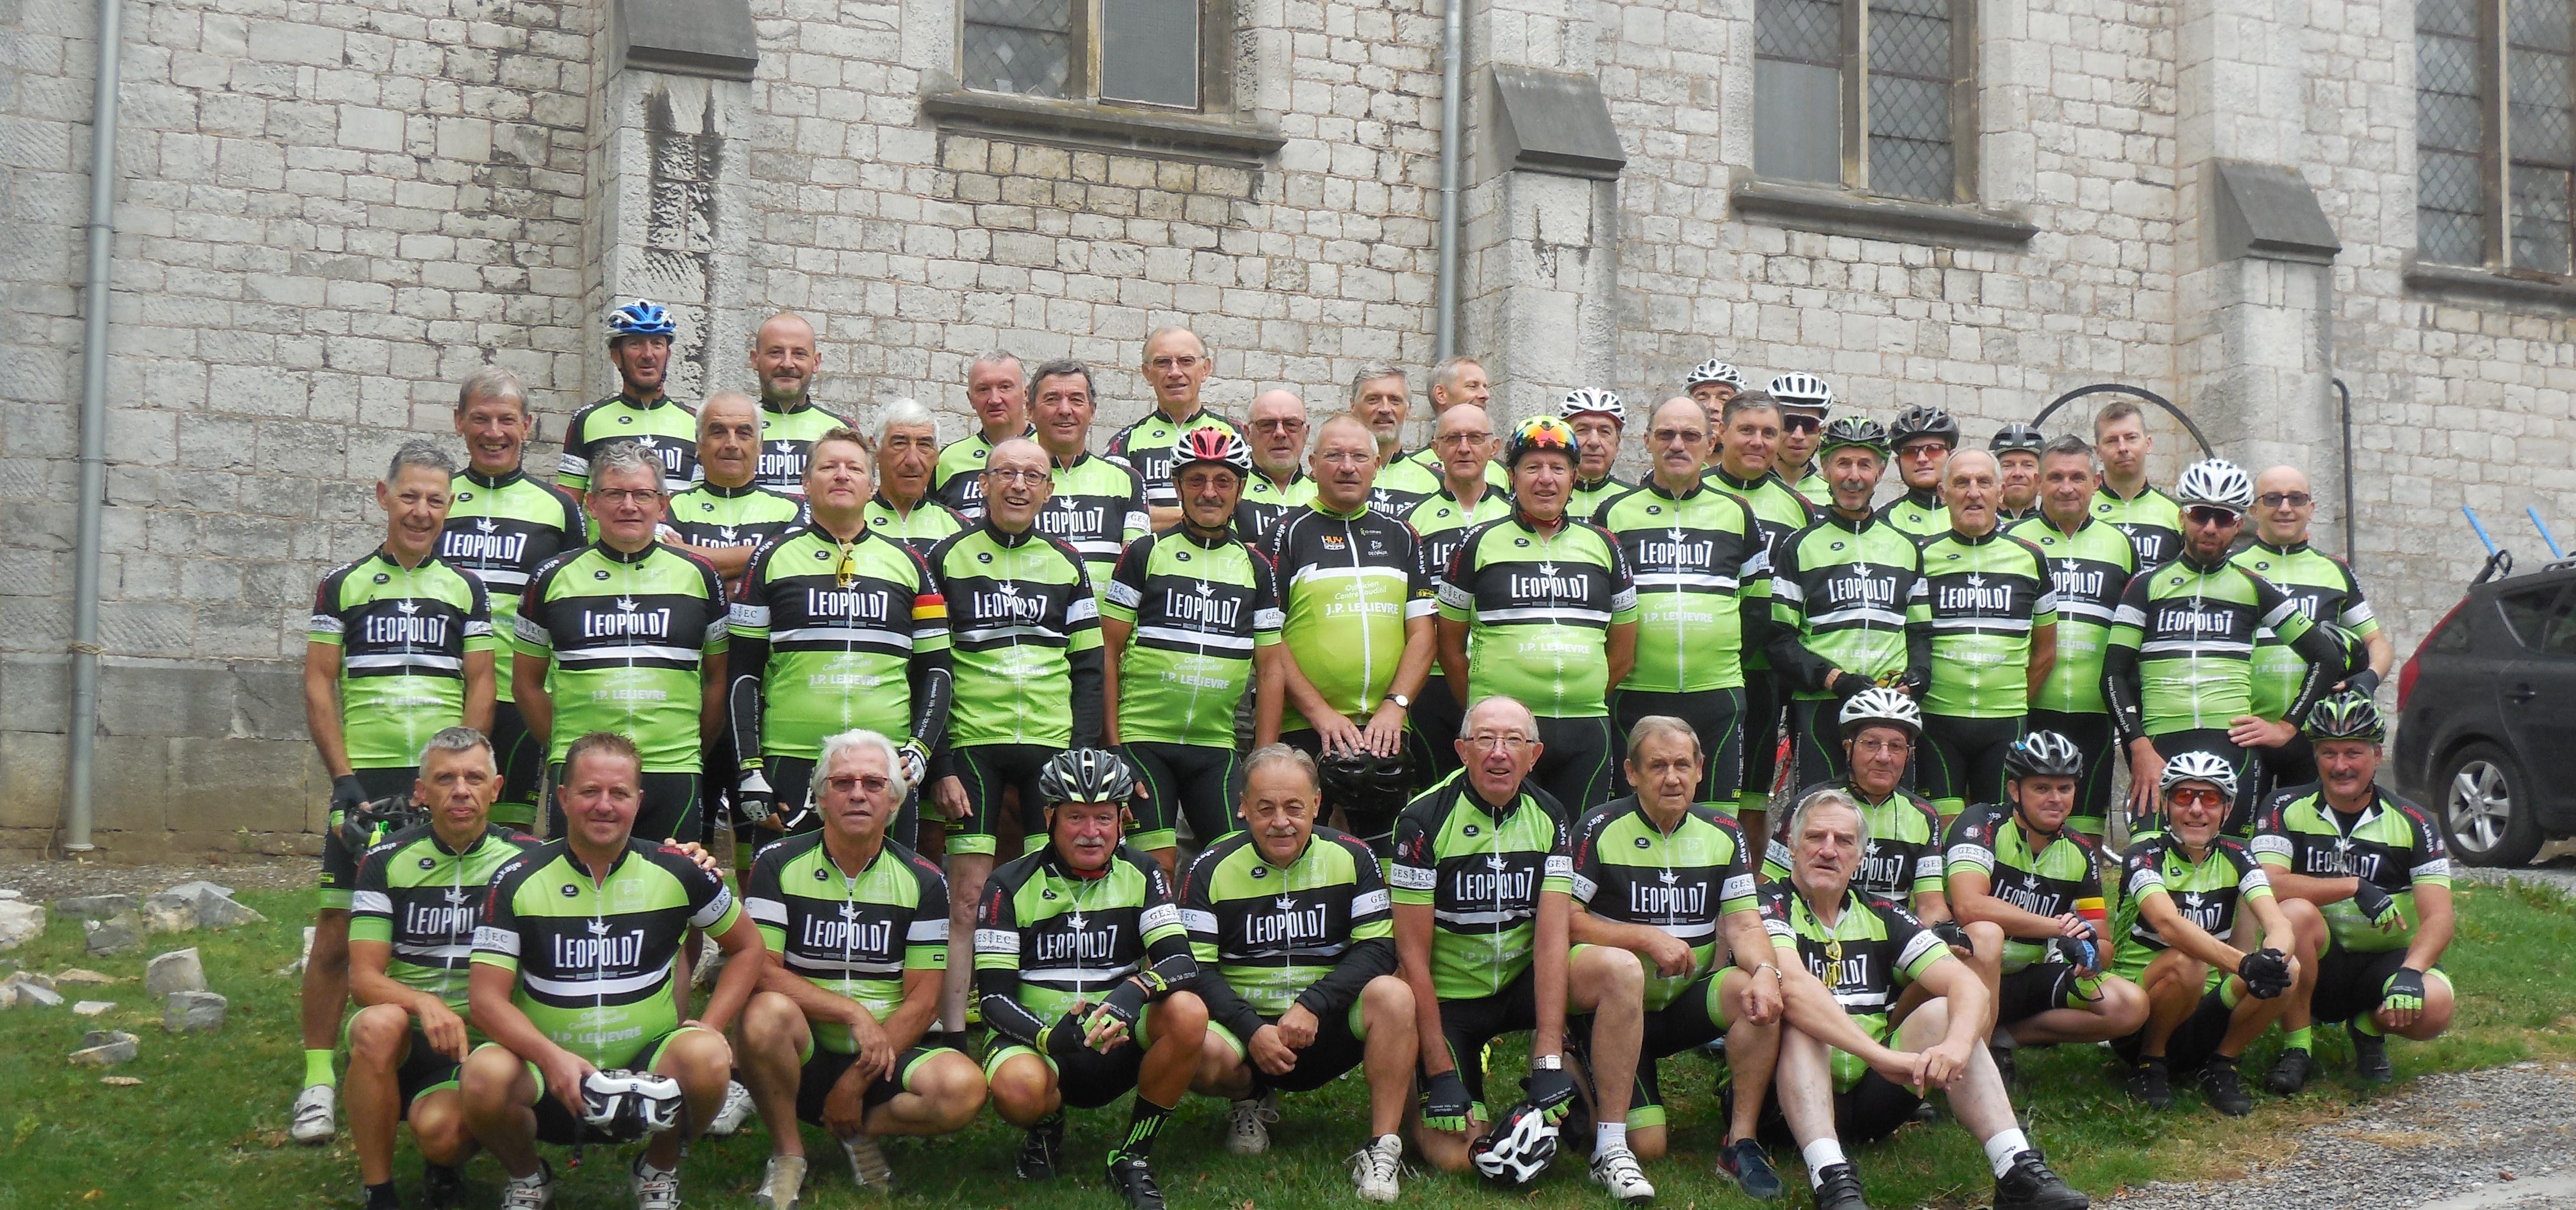 Promenade Vélo Club Couthuin - since 1984